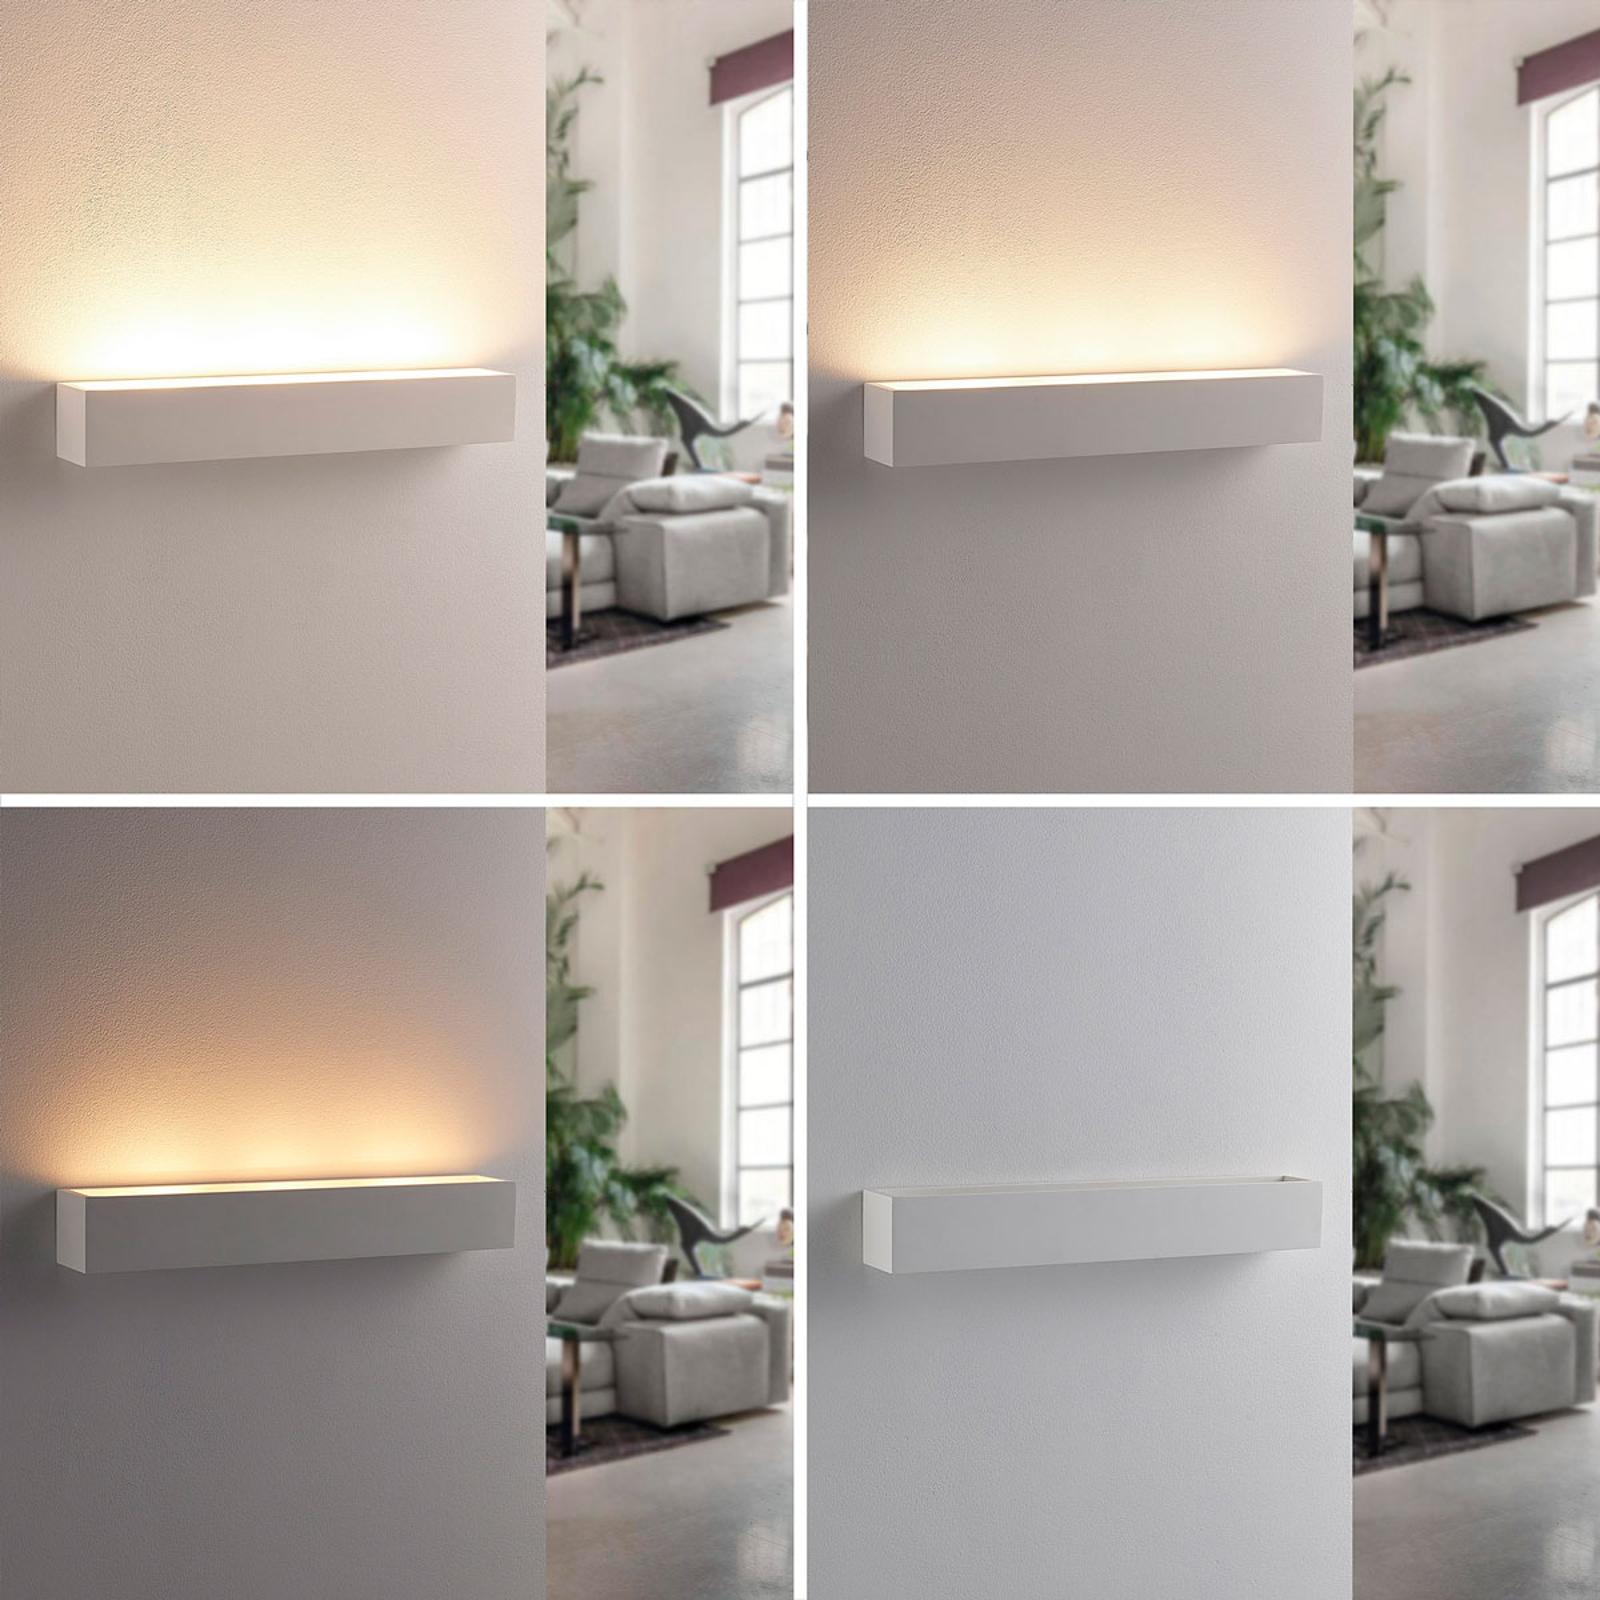 Wallwasher LED Santino di gesso bianco